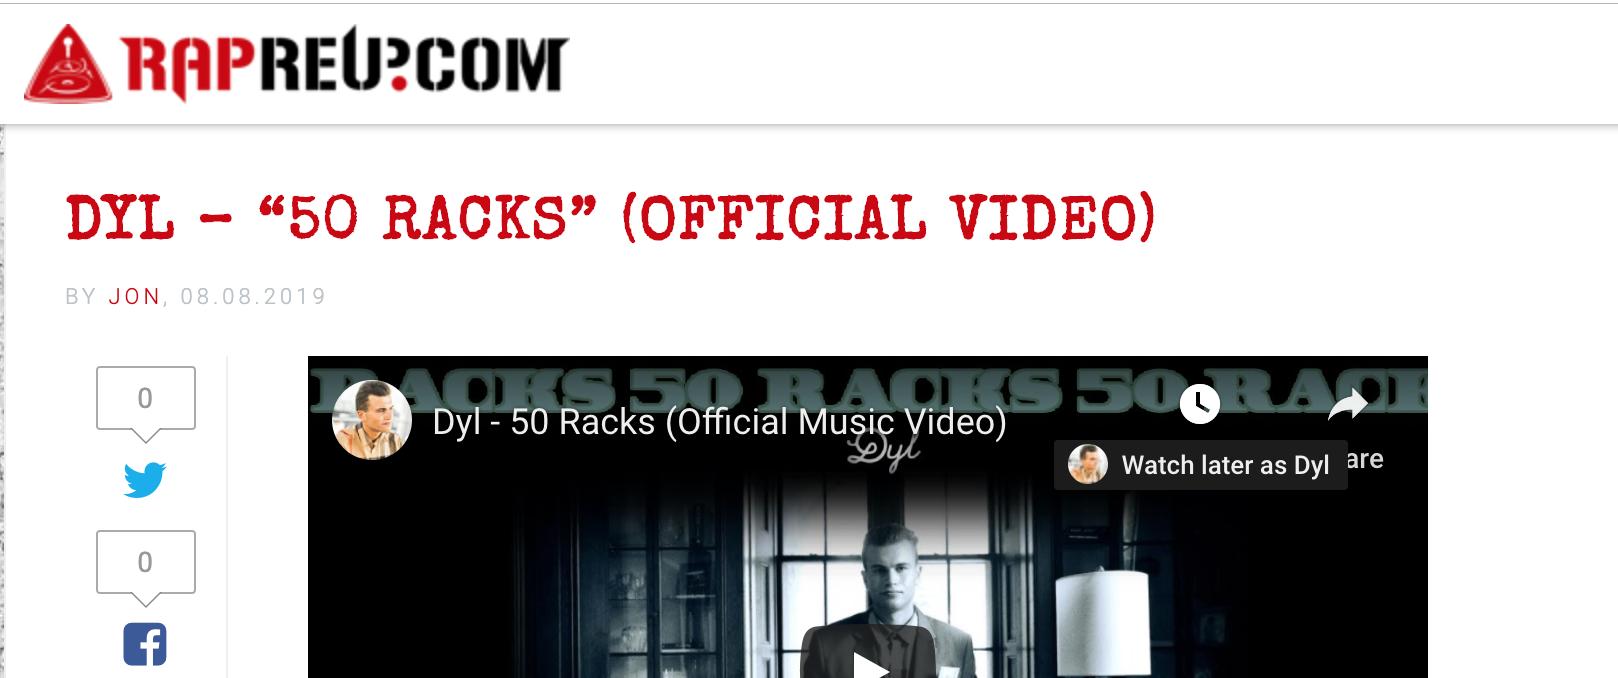 Dyl - 50 Racks Rap Reup